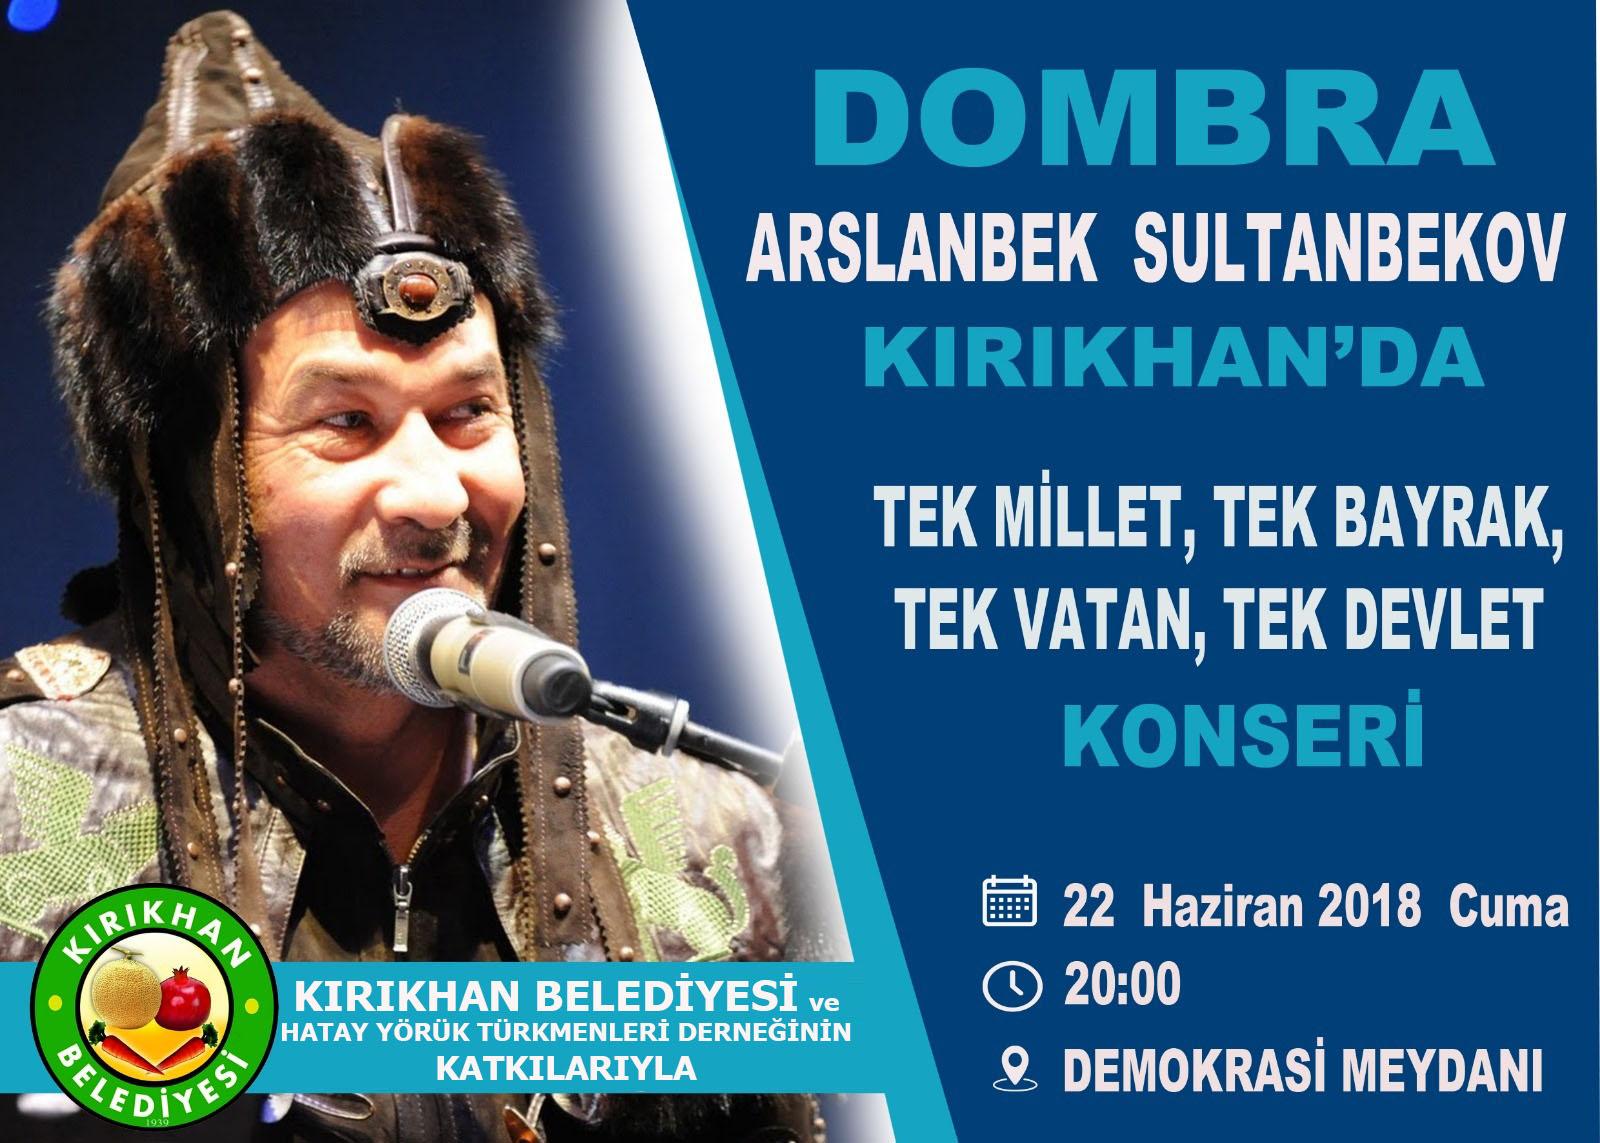 Arslanbek Sultanbekov Kırıkhan'a geliyor